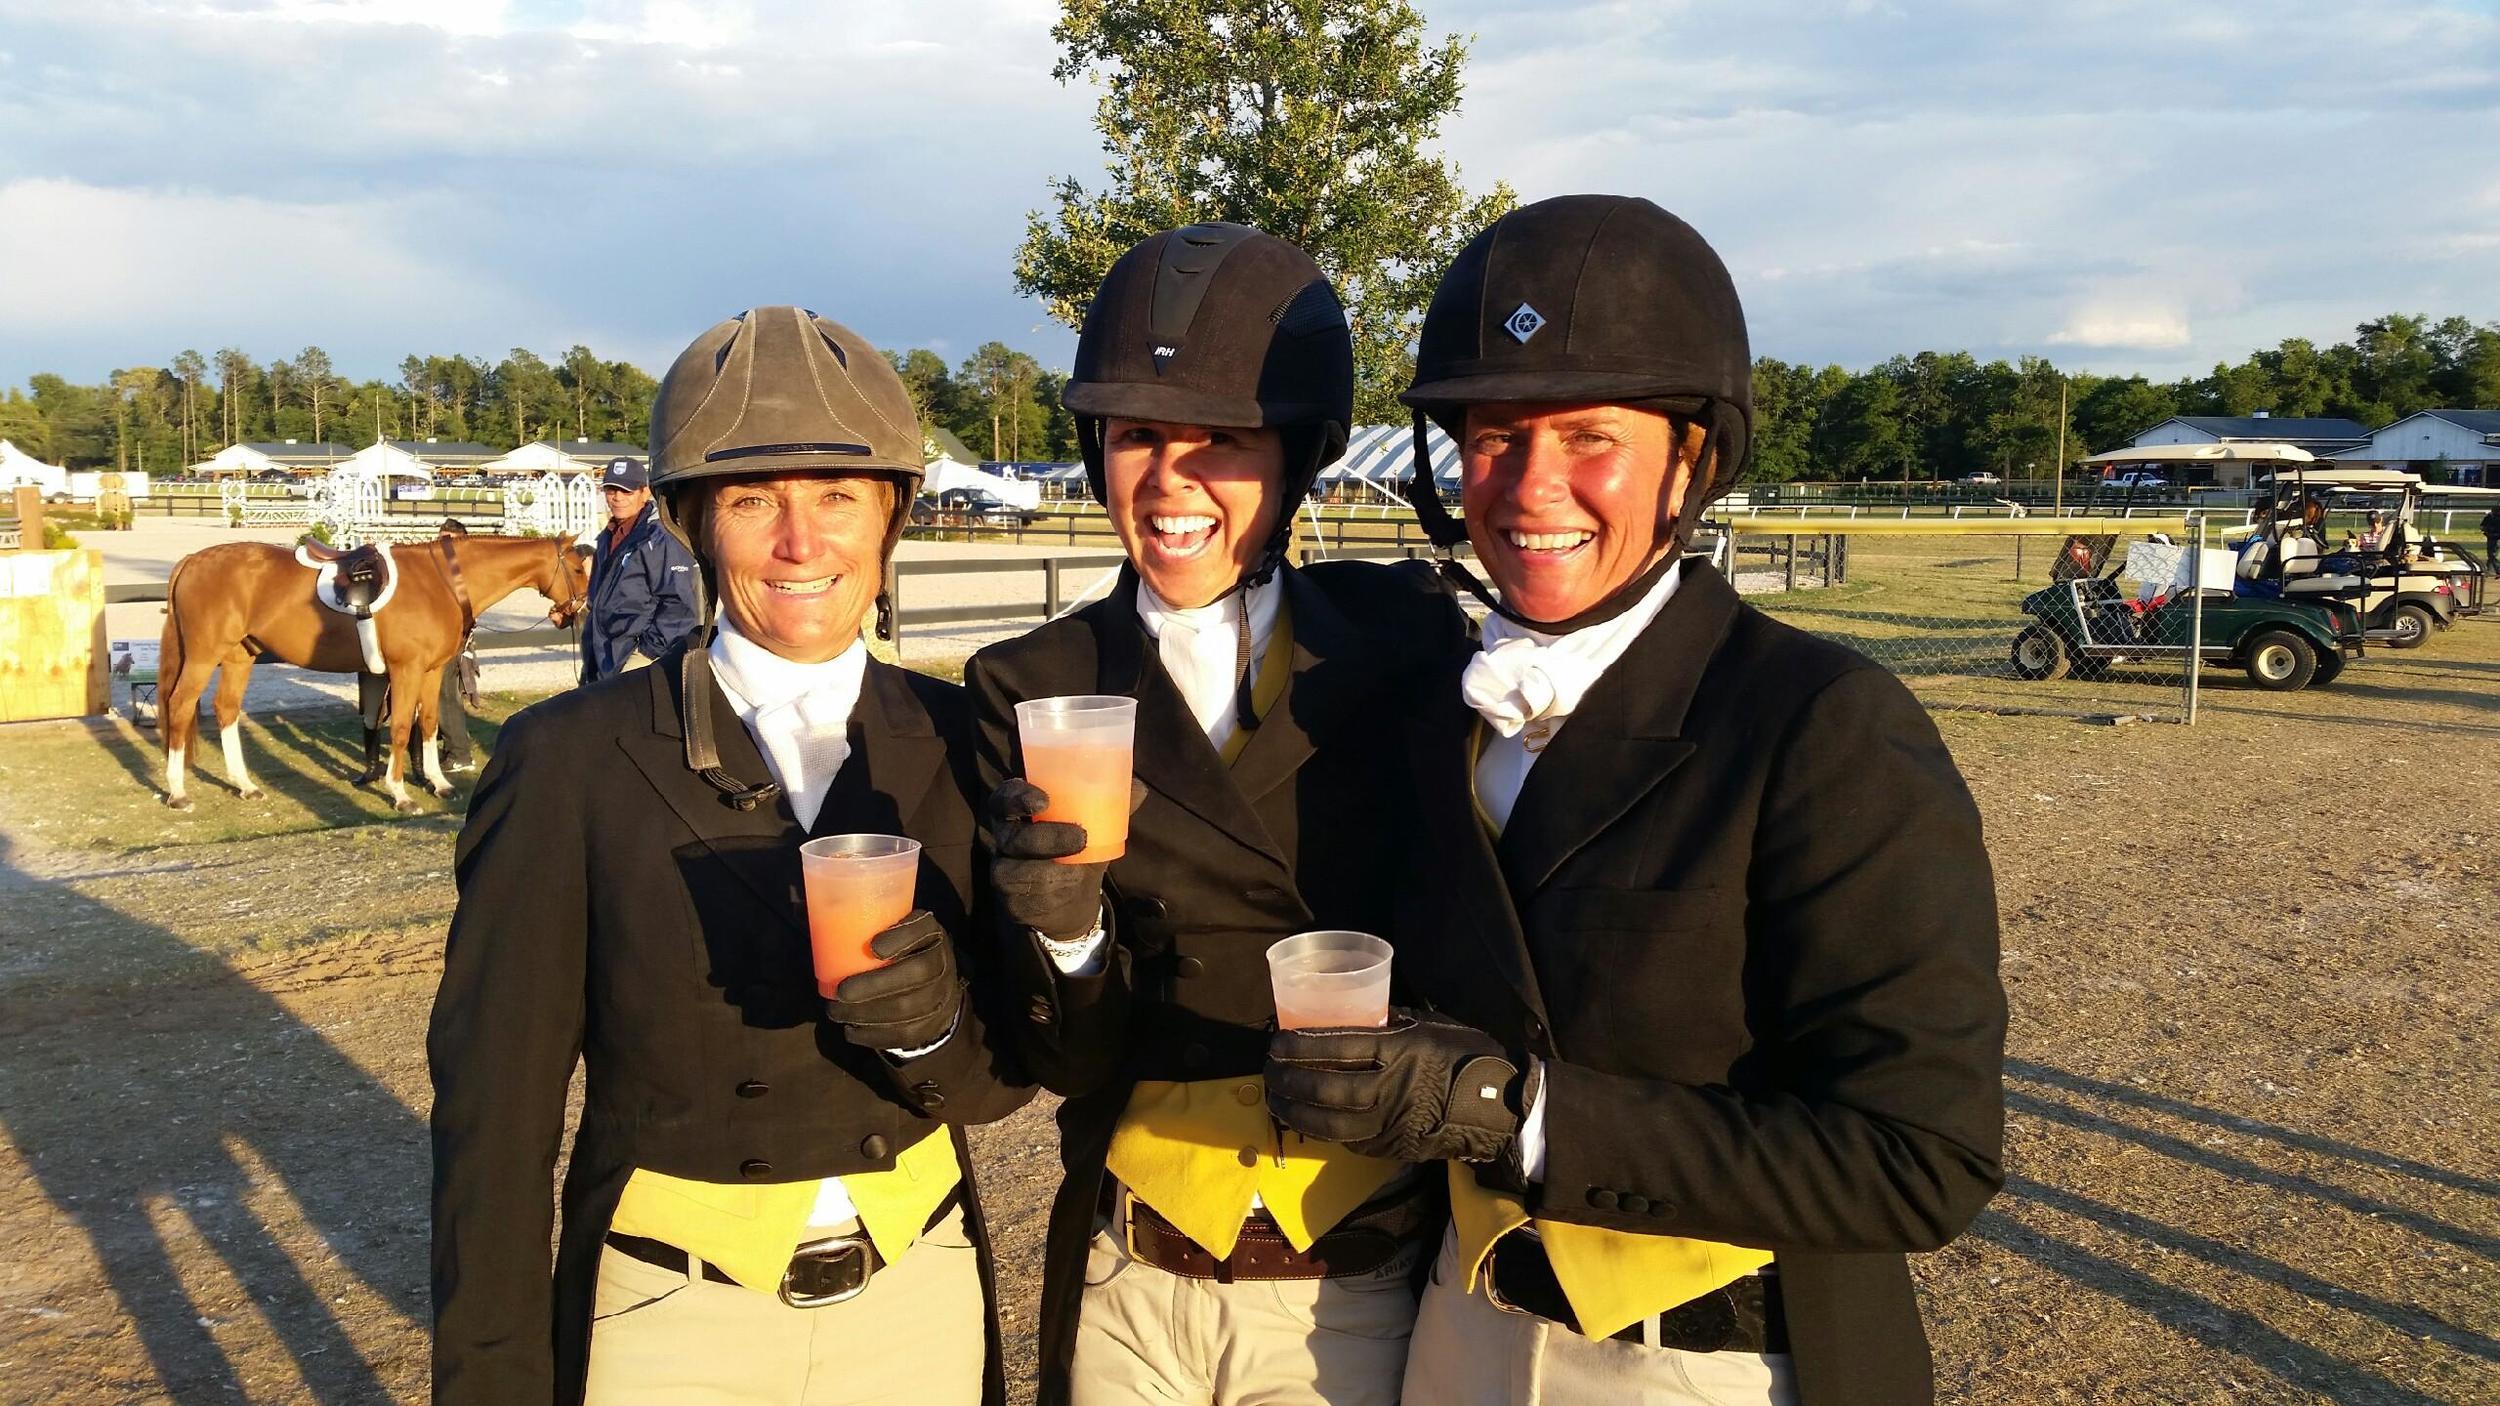 Havens Schatt, Liza Boyd and Jennifer Alfano enjoy the Aiken hospitality.